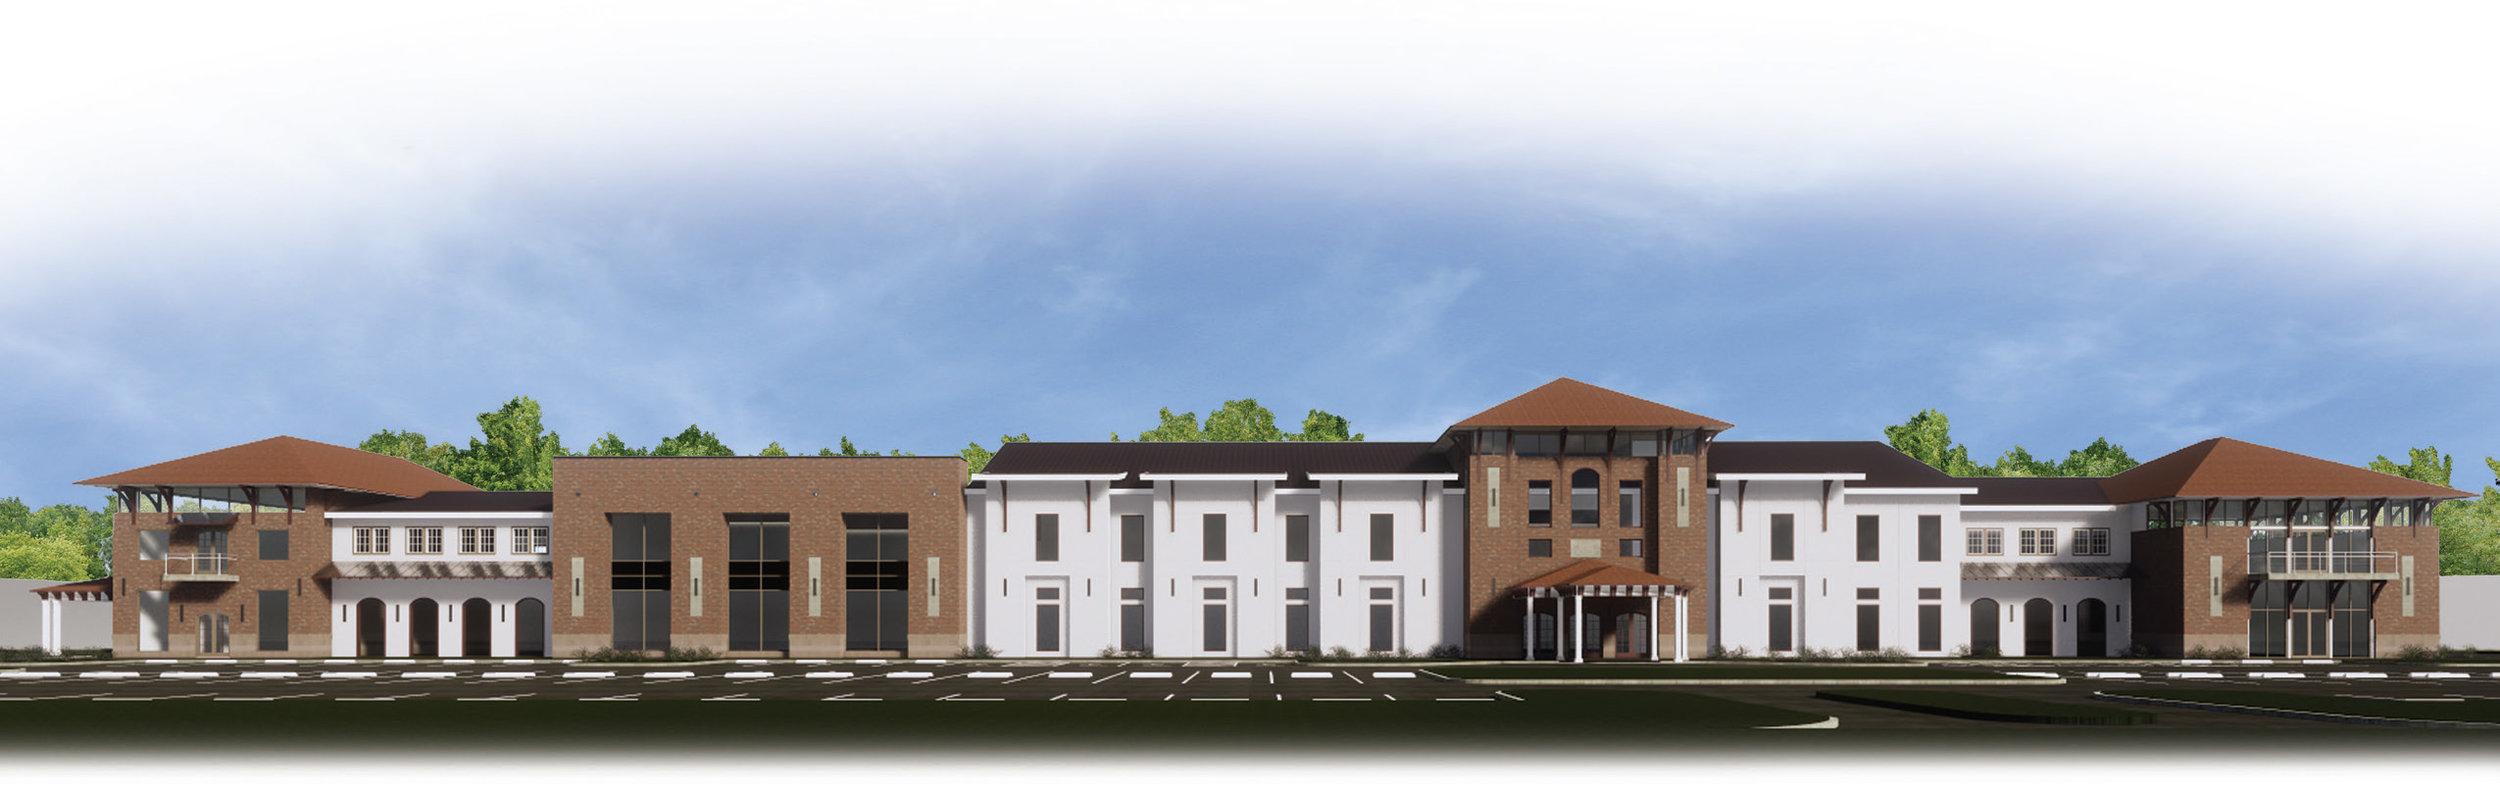 Southlake Medical Center - greenleaf-lawson-architects.jpg